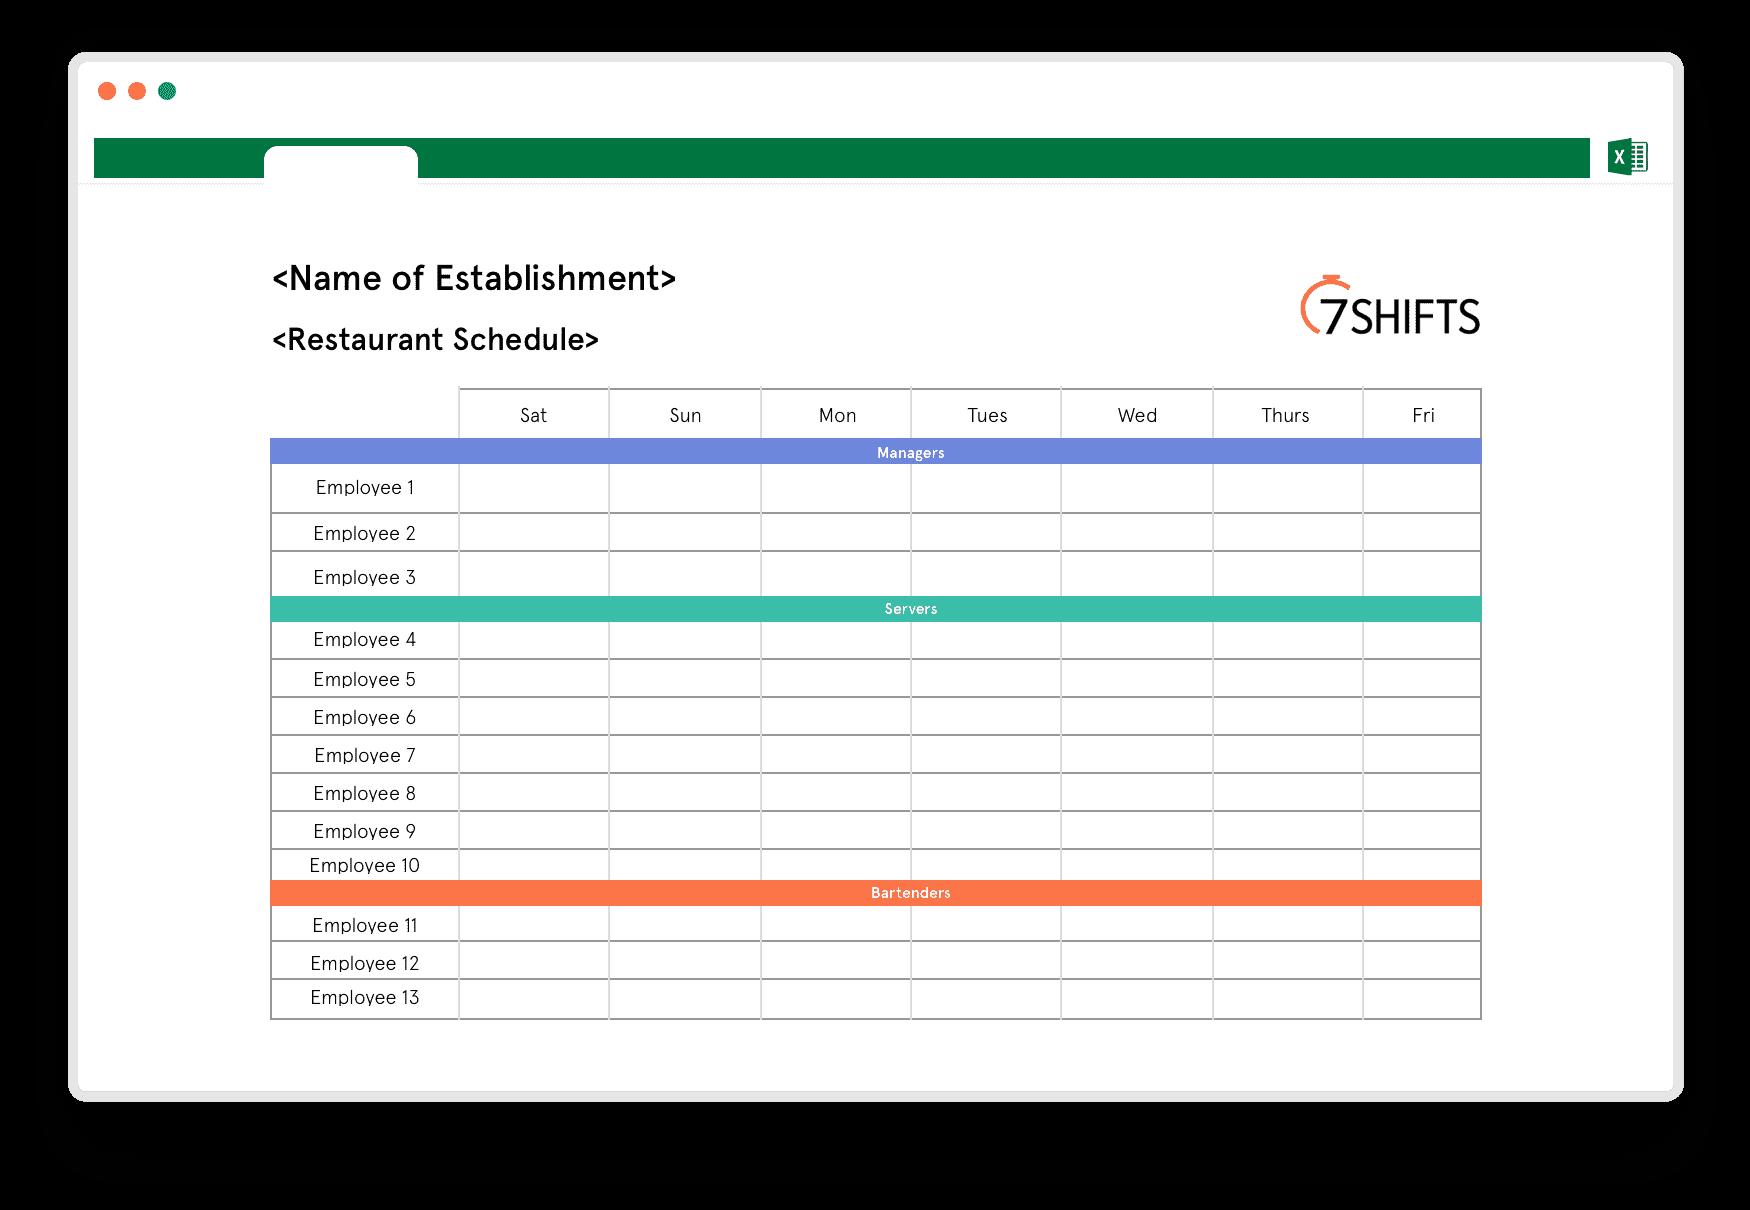 Restaurant Schedule Excel Template 7shifts